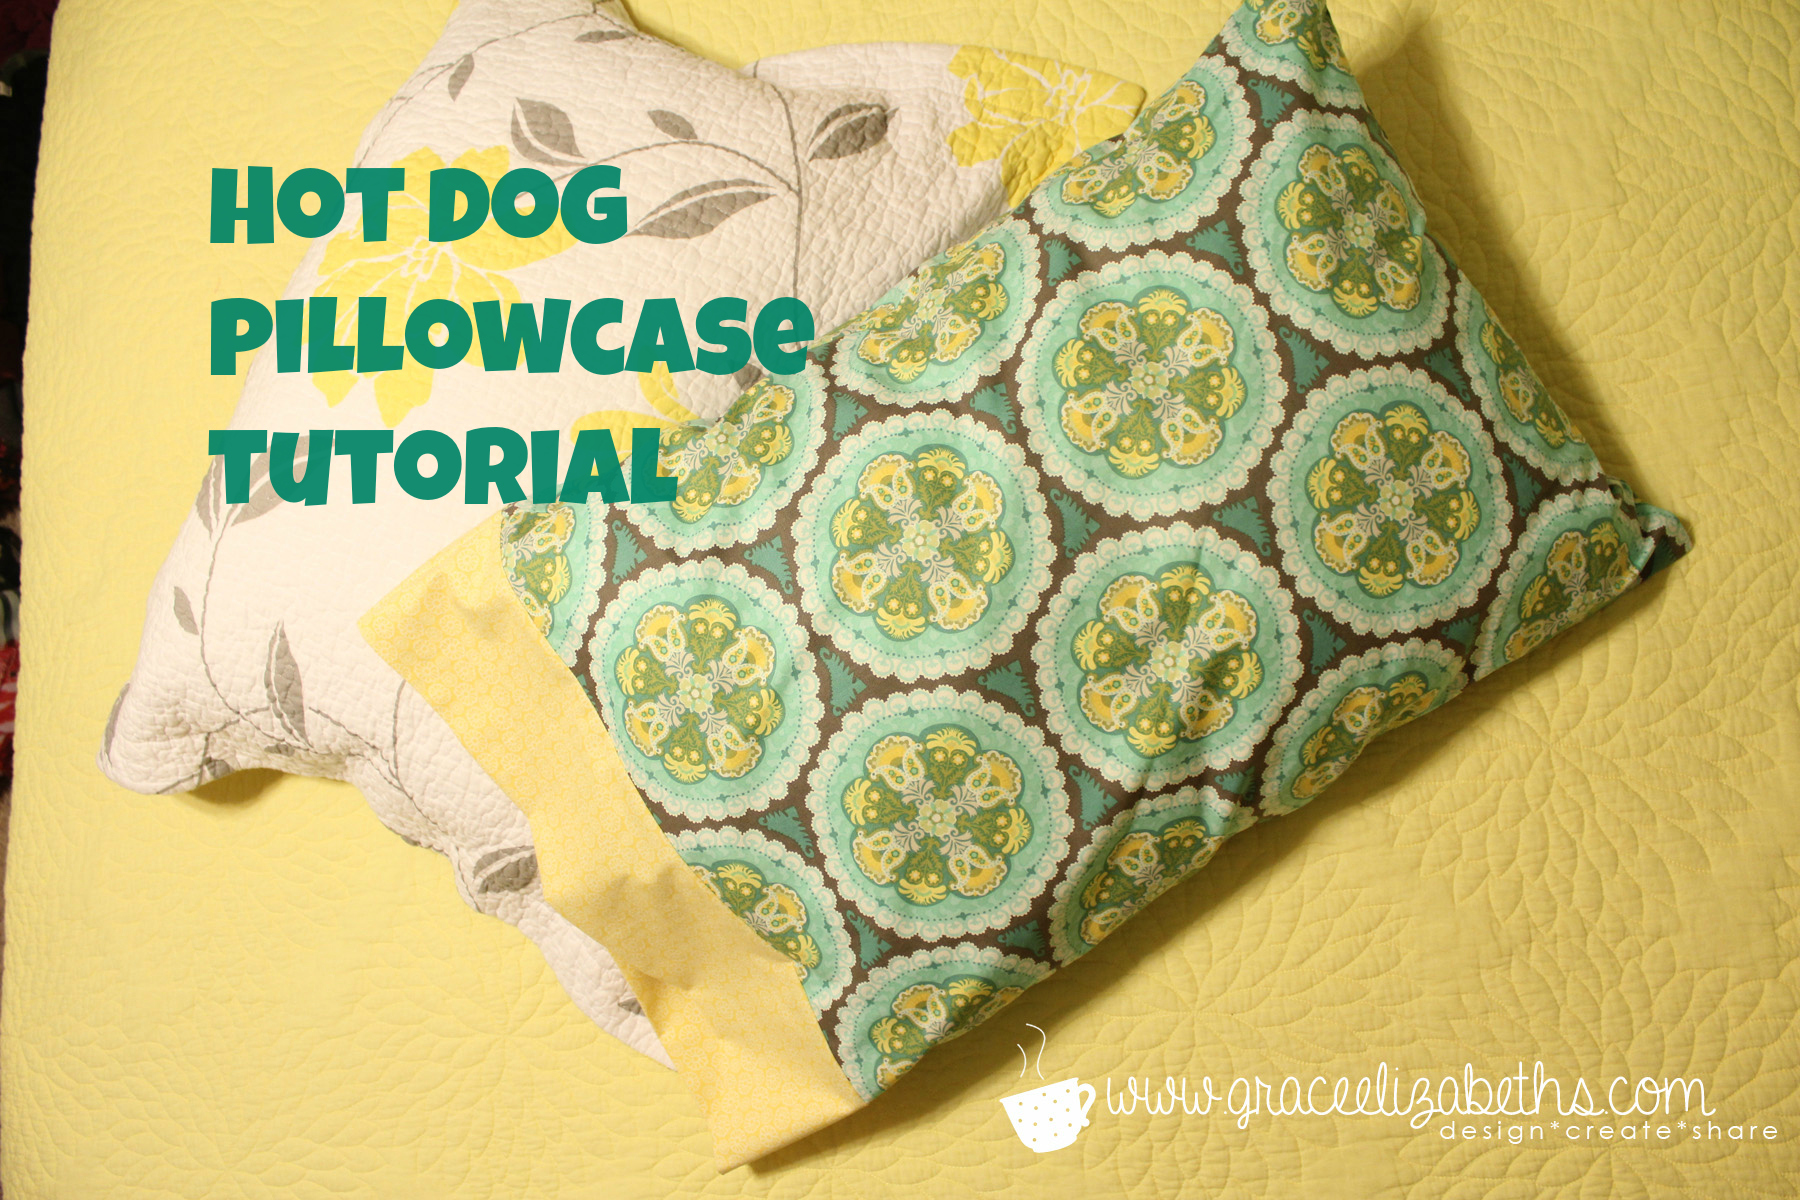 How To Make A Hot Dog Pillowcase